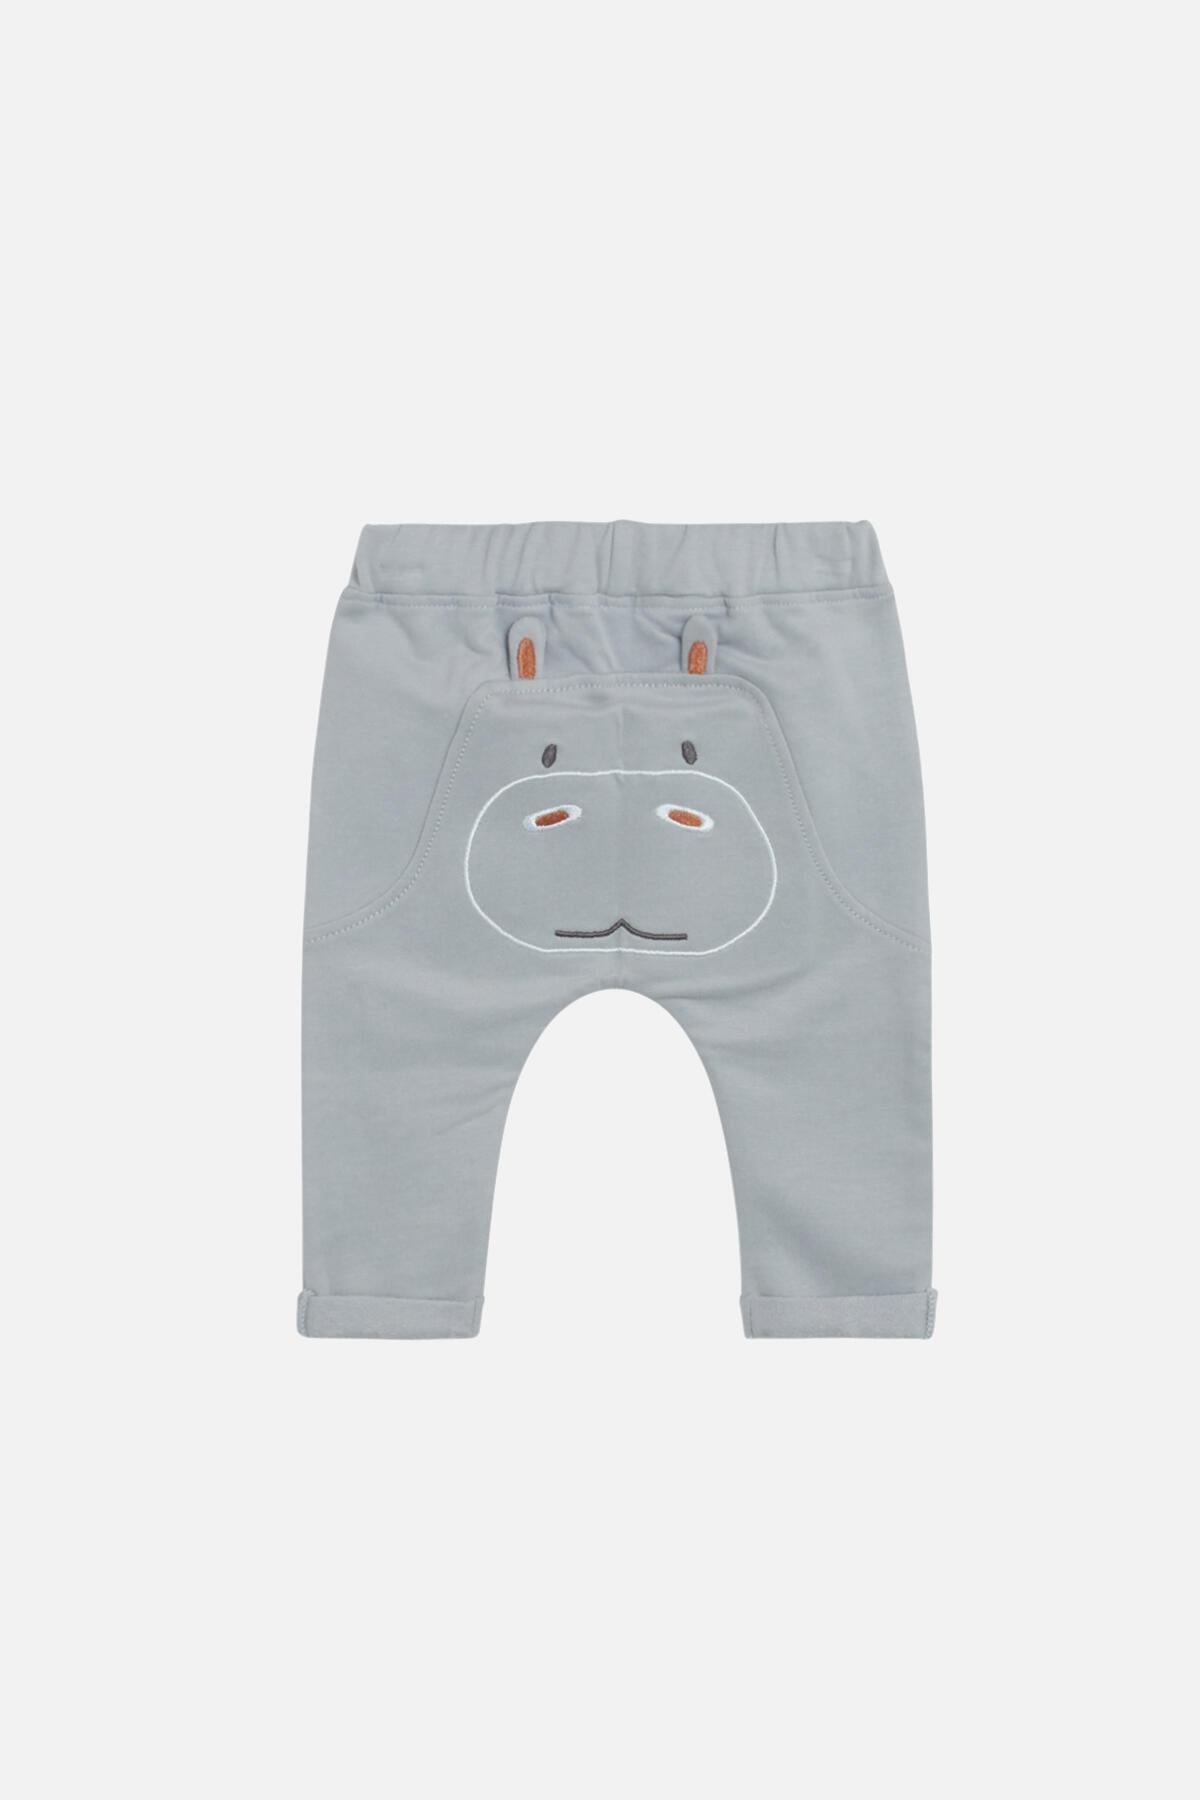 Newborn - Go - Jogging Trousers